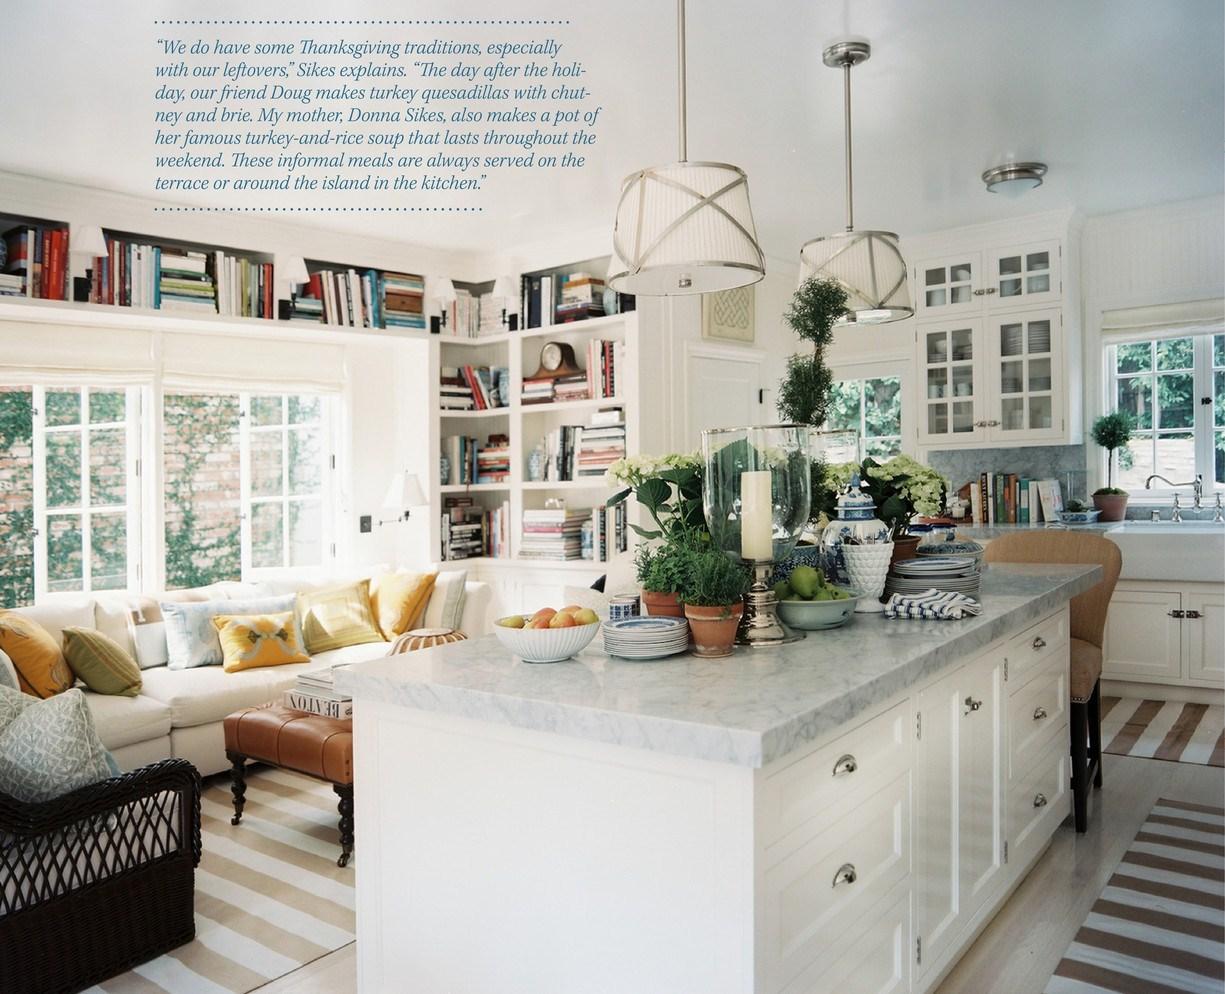 holiday in the hollywood hills vim vintage design life style. Black Bedroom Furniture Sets. Home Design Ideas